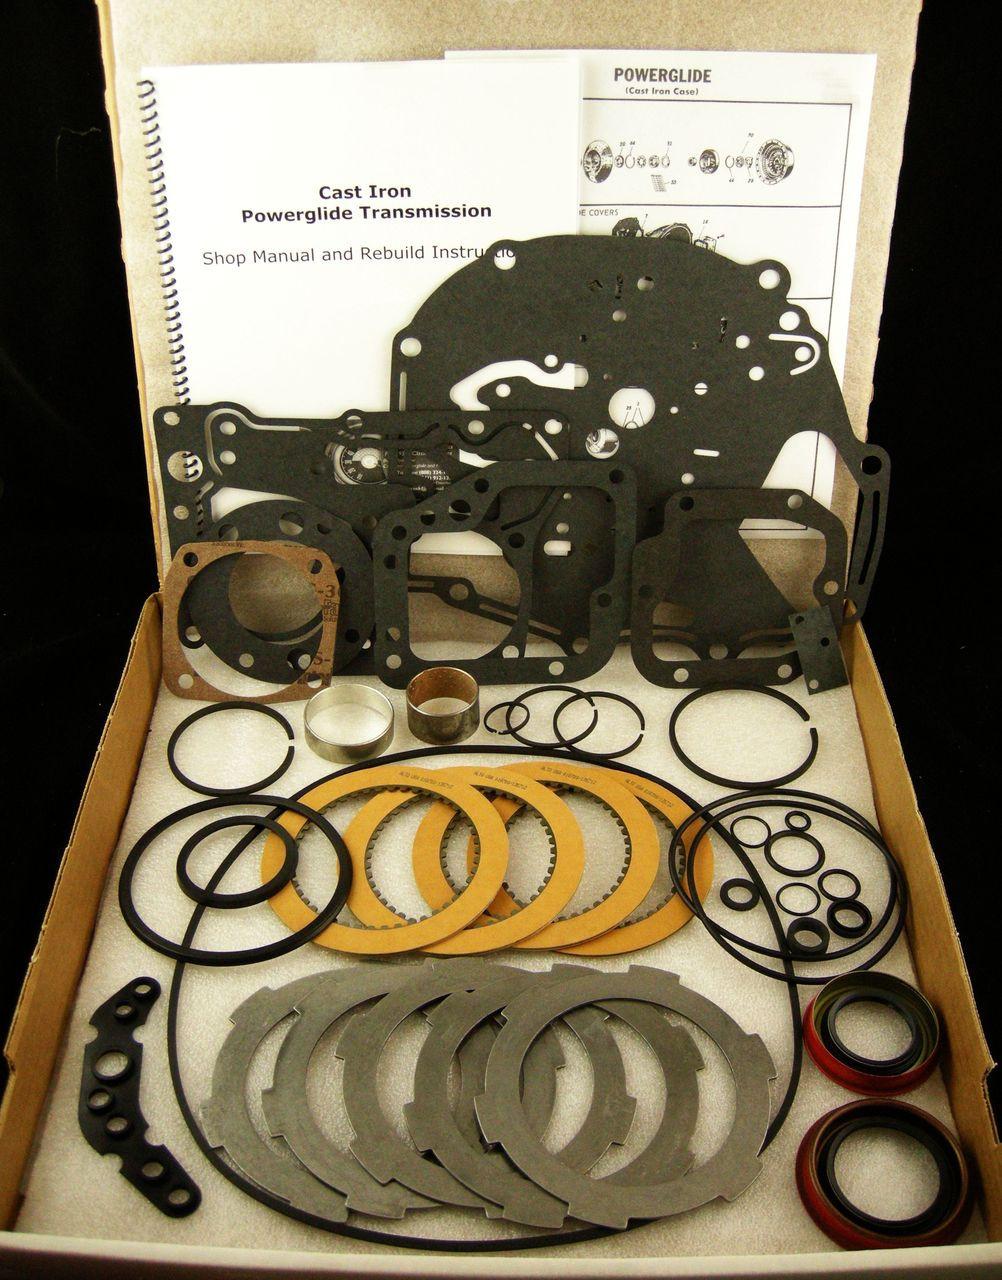 cast iron powerglide master rebuild kit 1958 1959 1960 [ 1002 x 1280 Pixel ]